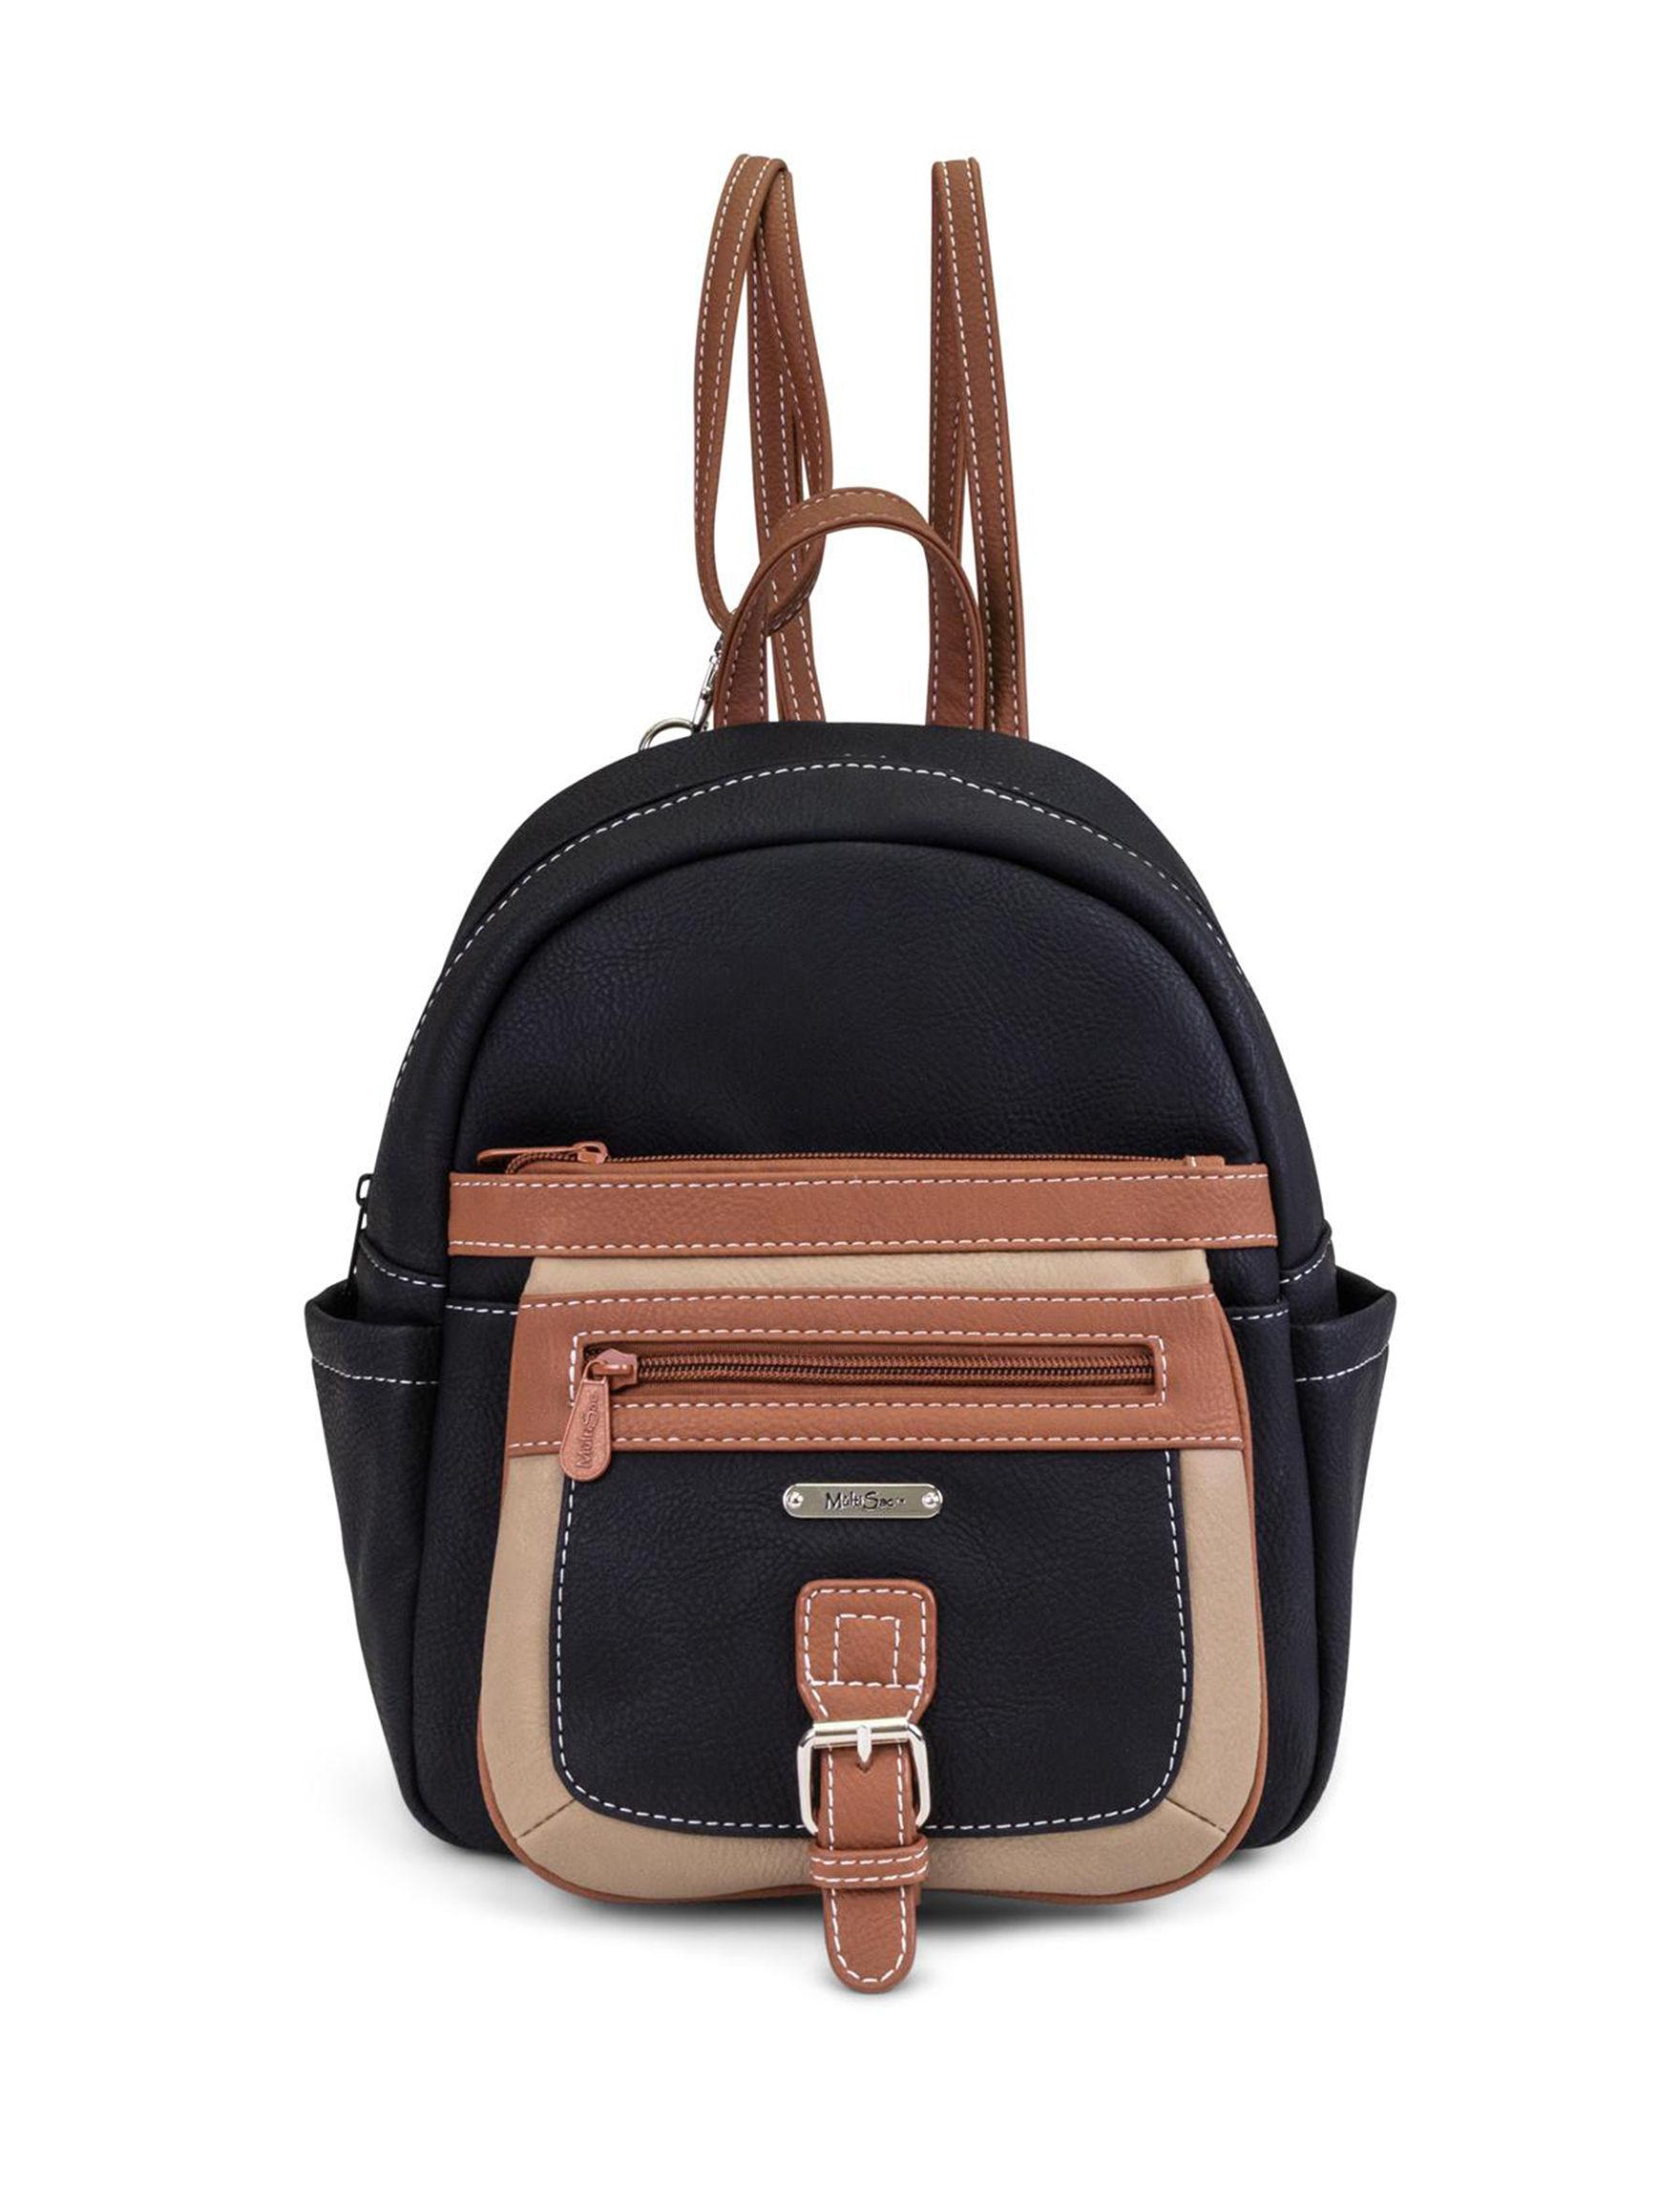 Koltov Black Multi Bookbags & Backpacks